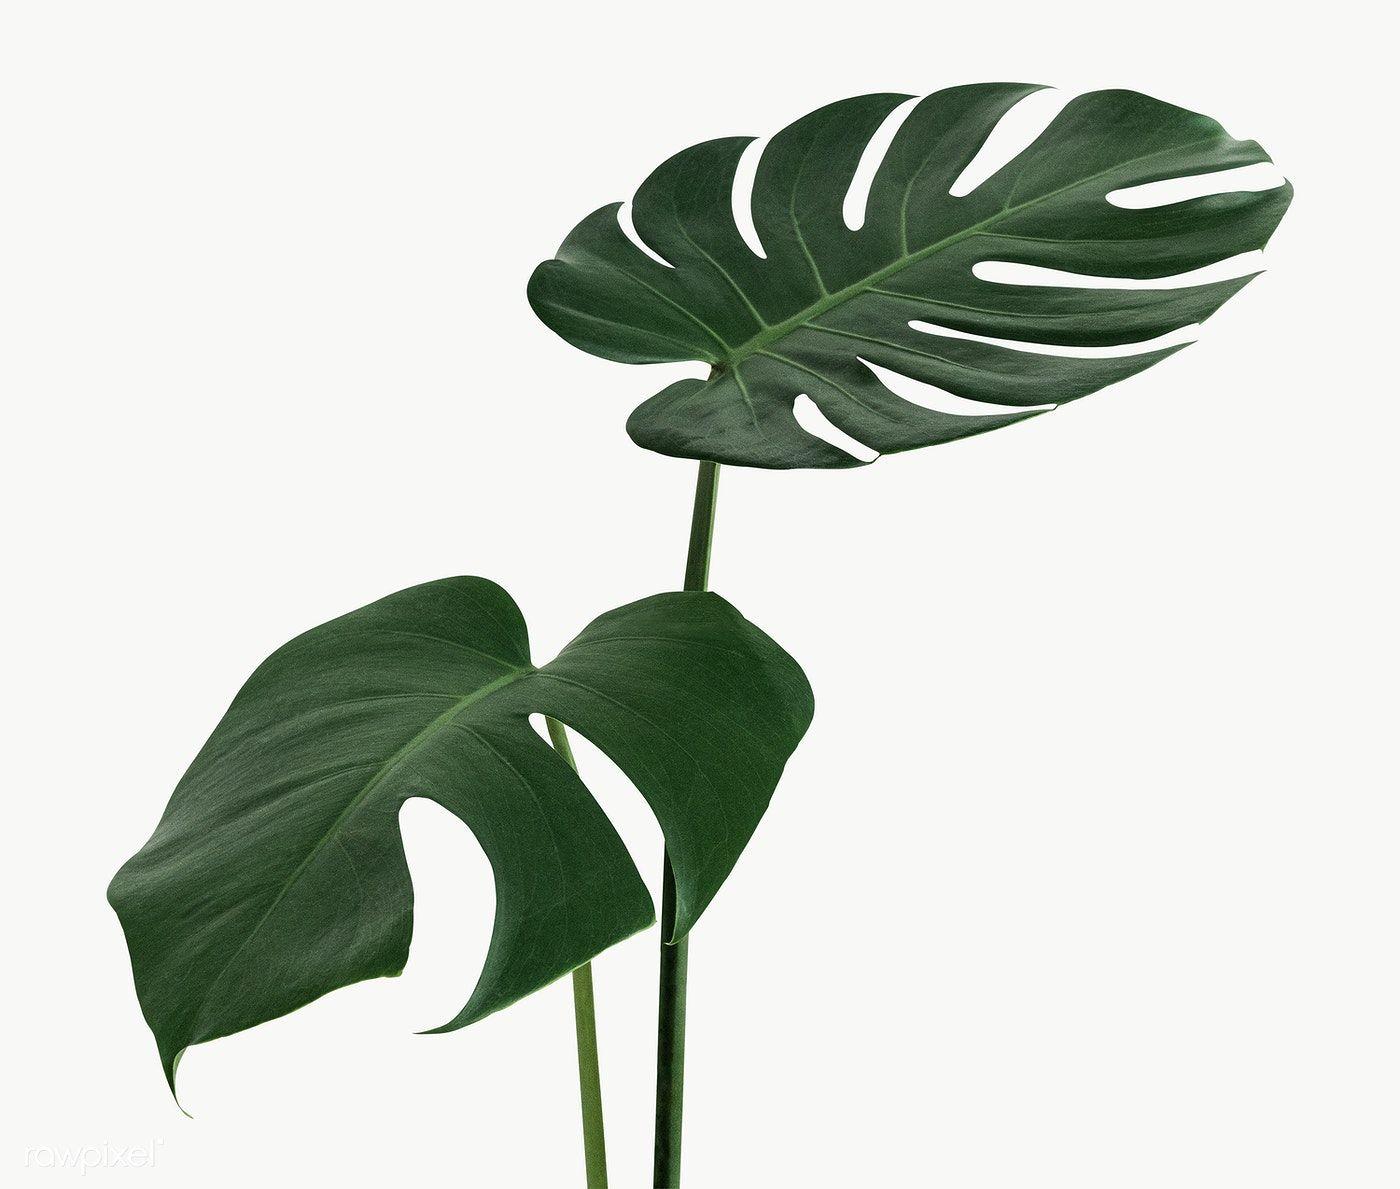 Split Leaf Philodendron Monstera Plant Element Transparent Png Free Image By Rawpixel Com Teddy Rawpixel Plants Monstera Plant Leaves